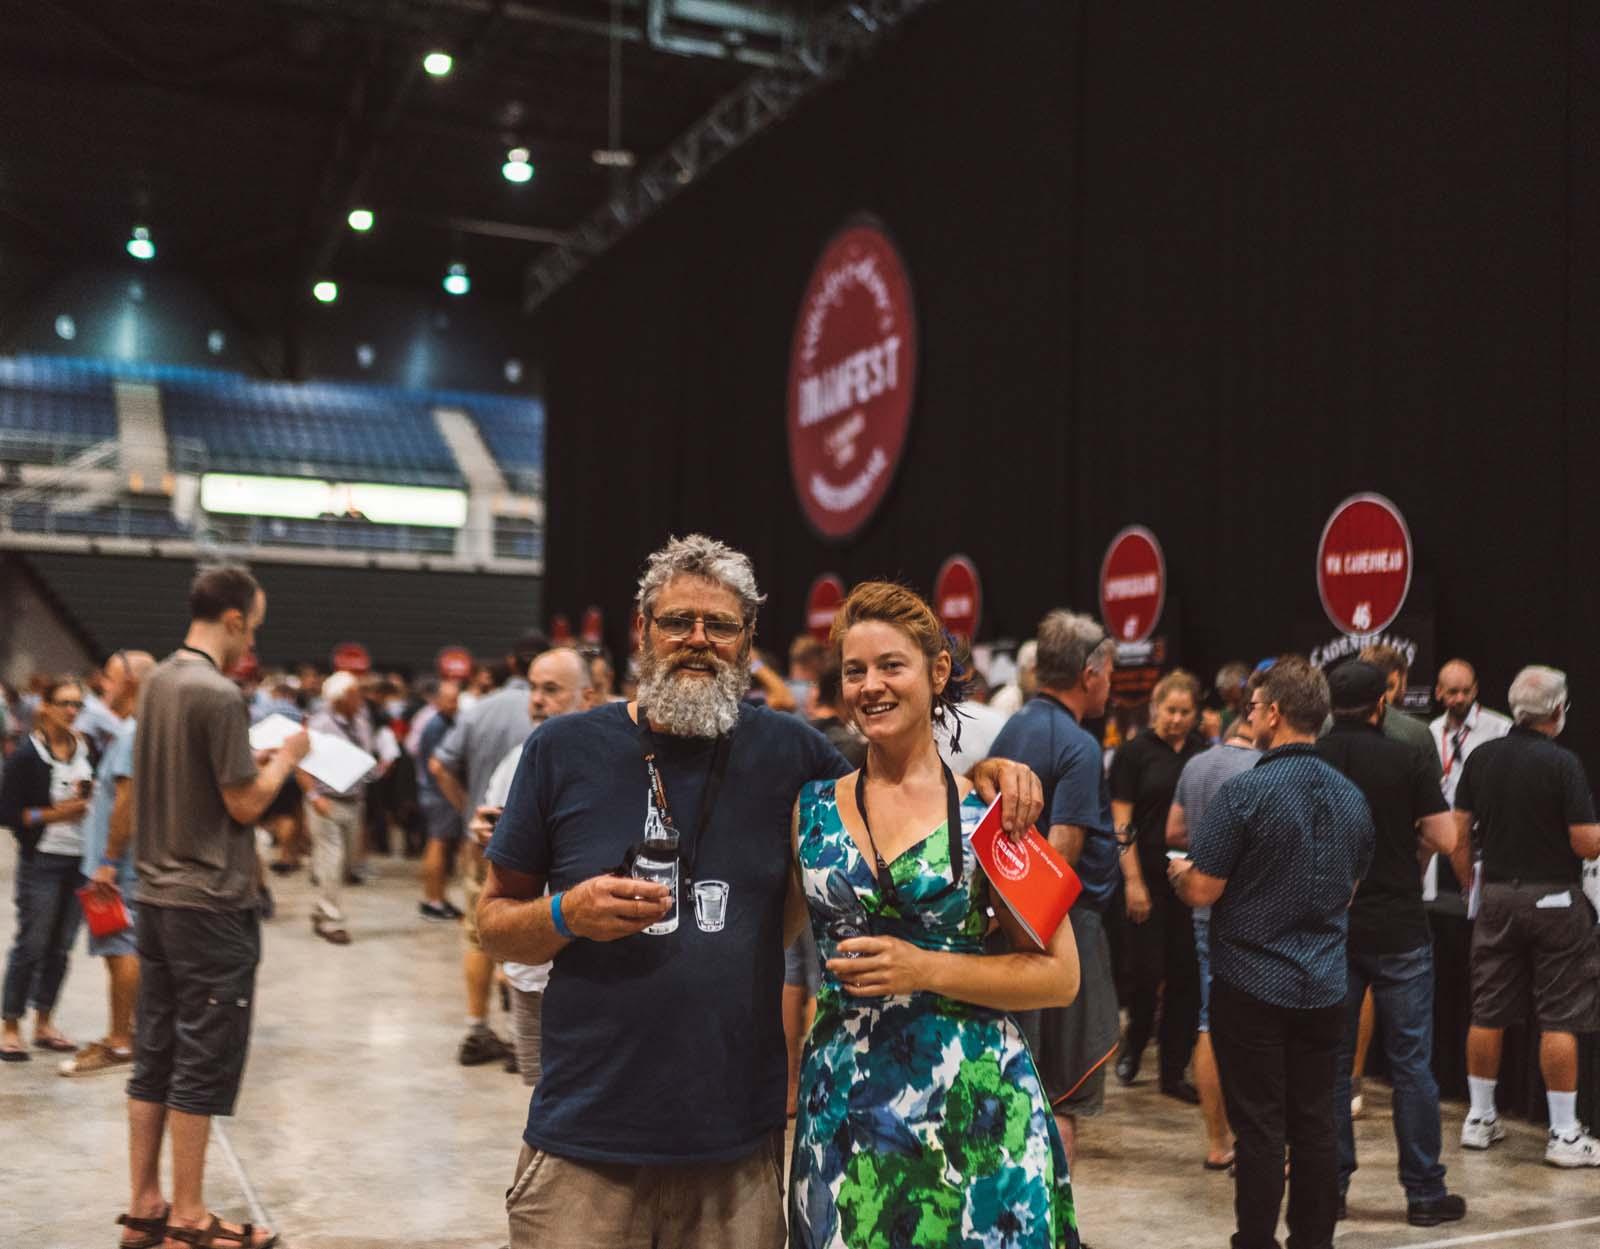 Dramfest 2018 for Whisky Galore-23.jpg